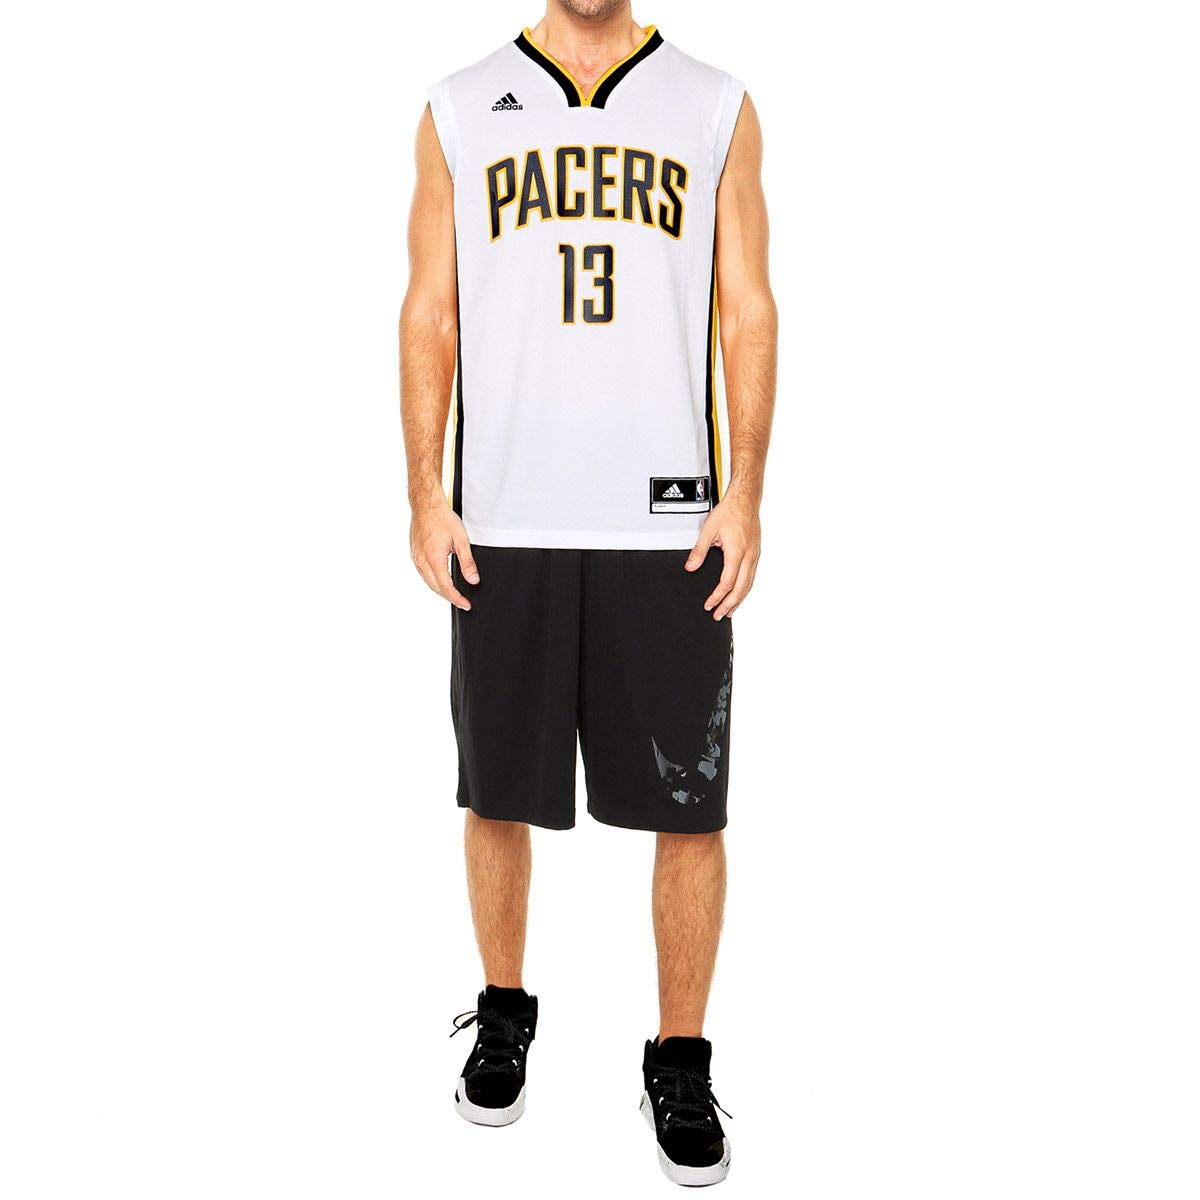 dabc72d2a Camisa Regata Adidas Nba Indiana Pacers Nº 13 George  Amazon.com.br   Esportes e Aventura